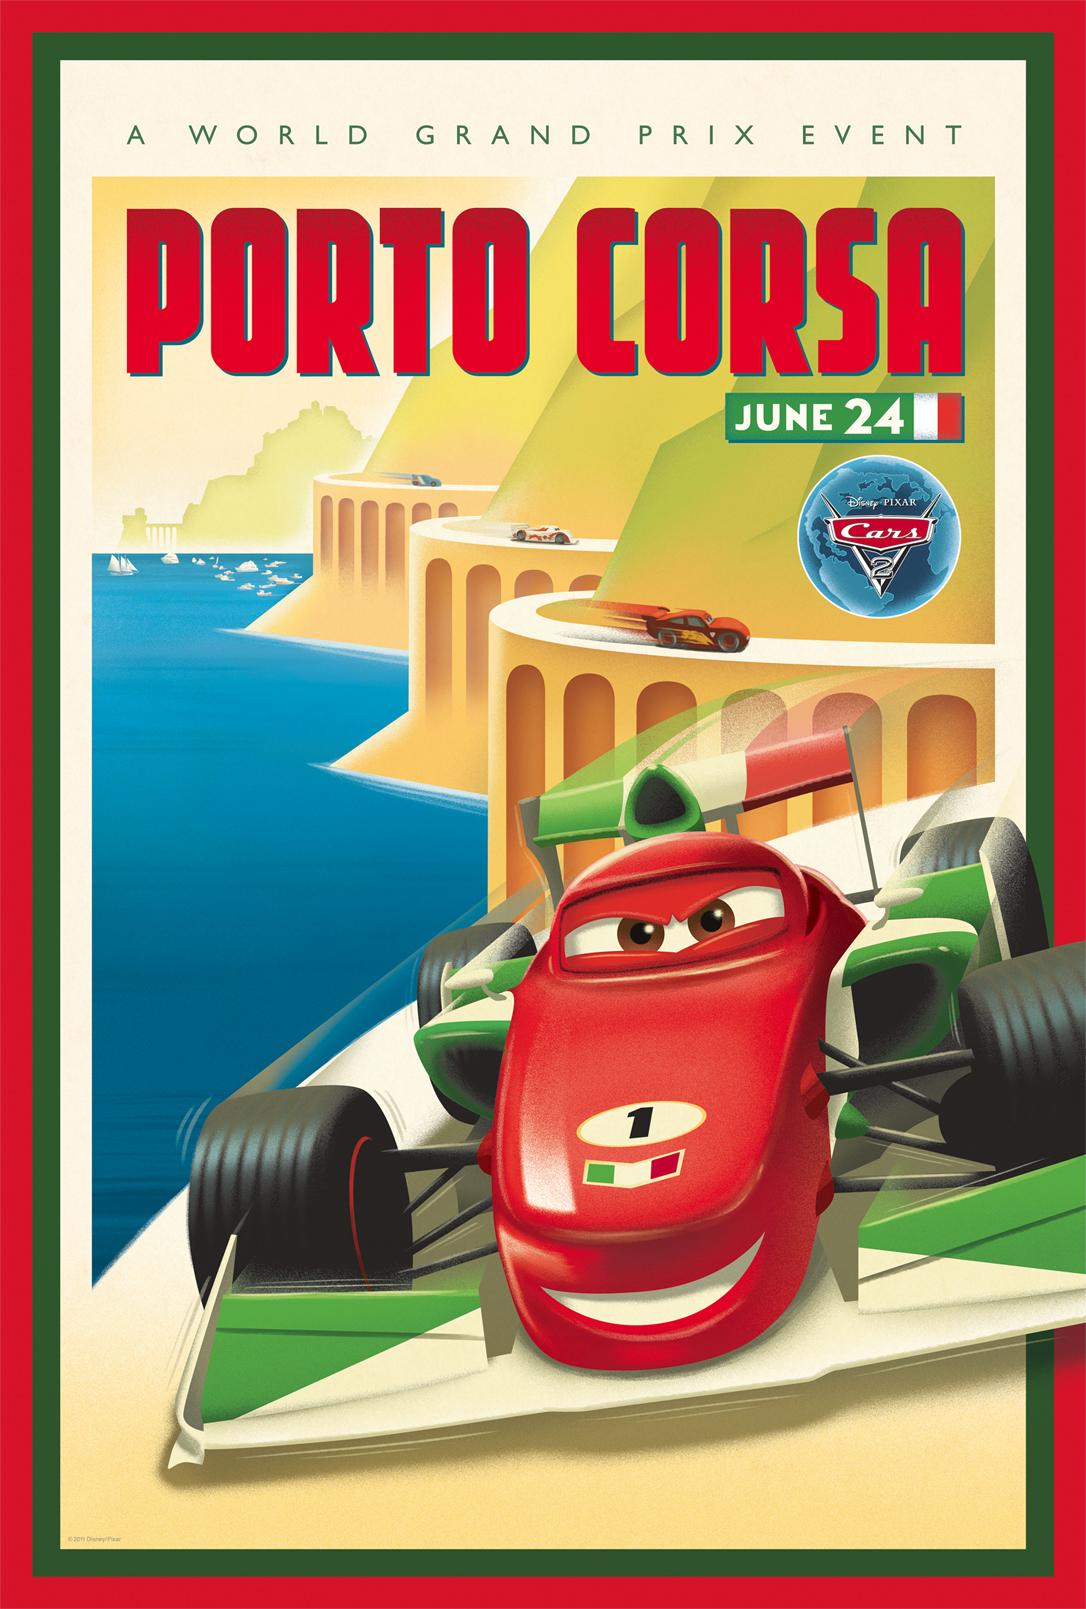 Cars 2 Vintage Poster Art - Porto Corsa - HeyUGuys